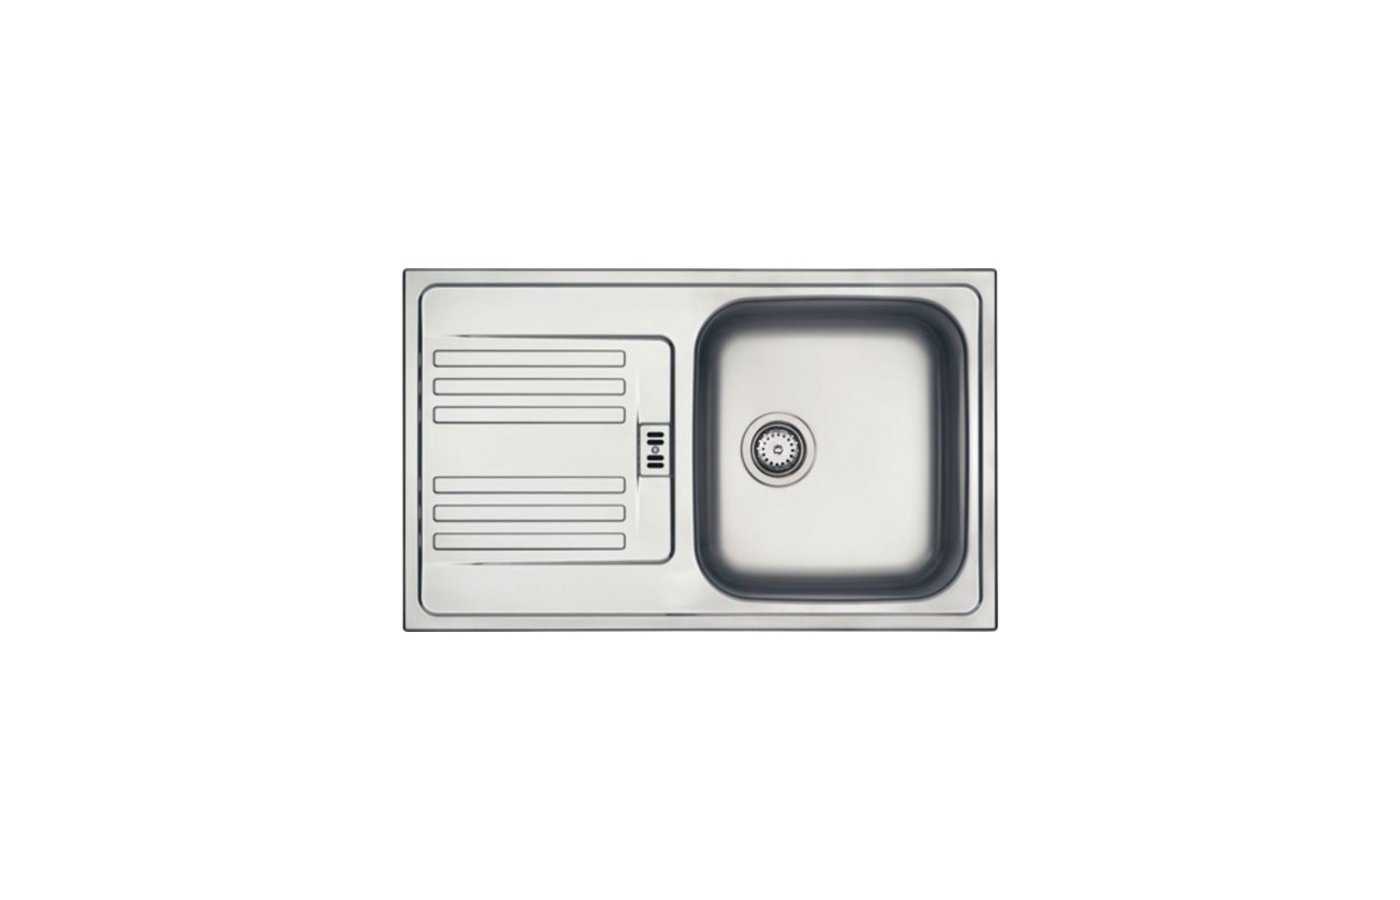 Кухонная мойка FRANKE EFN 614-78 Вентиль 3.5 + комплект для монтажа